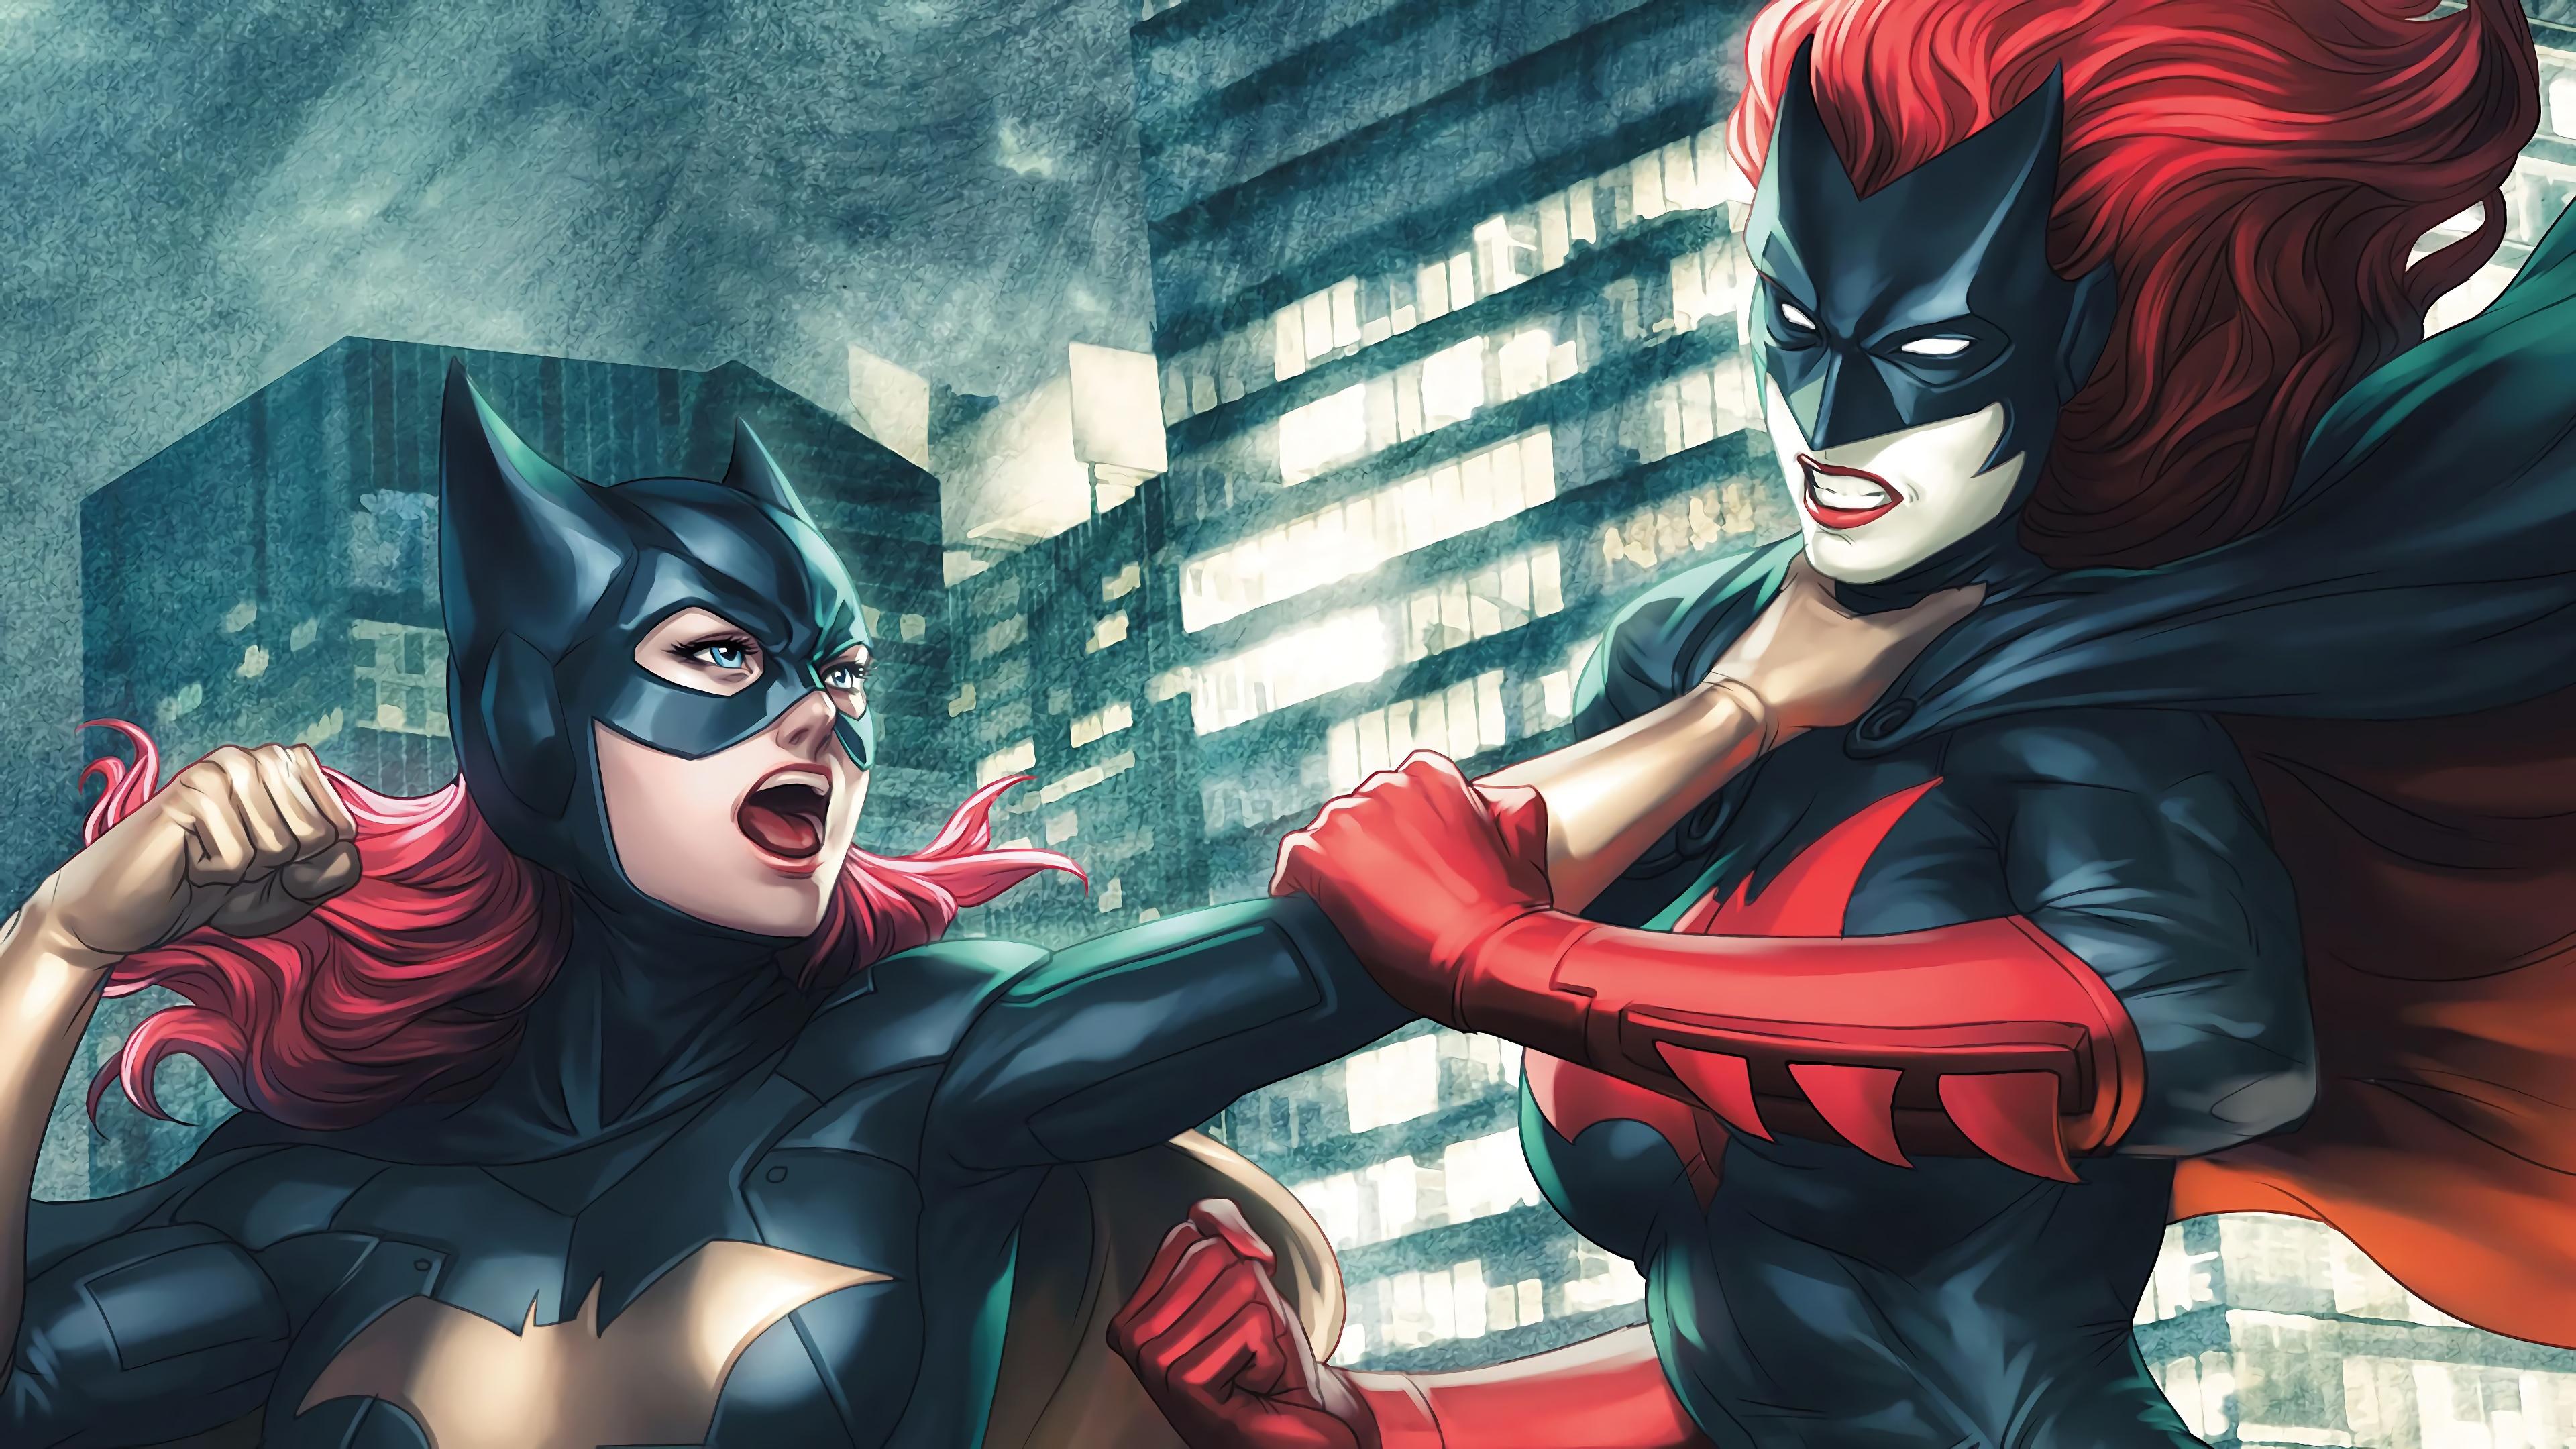 batgirl vs batwoman fight 4k 1547936626 - Batgirl Vs Batwoman Fight 4k - superheroes wallpapers, hd-wallpapers, digital art wallpapers, batwoman wallpapers, batgirl wallpapers, artwork wallpapers, artist wallpapers, 4k-wallpapers